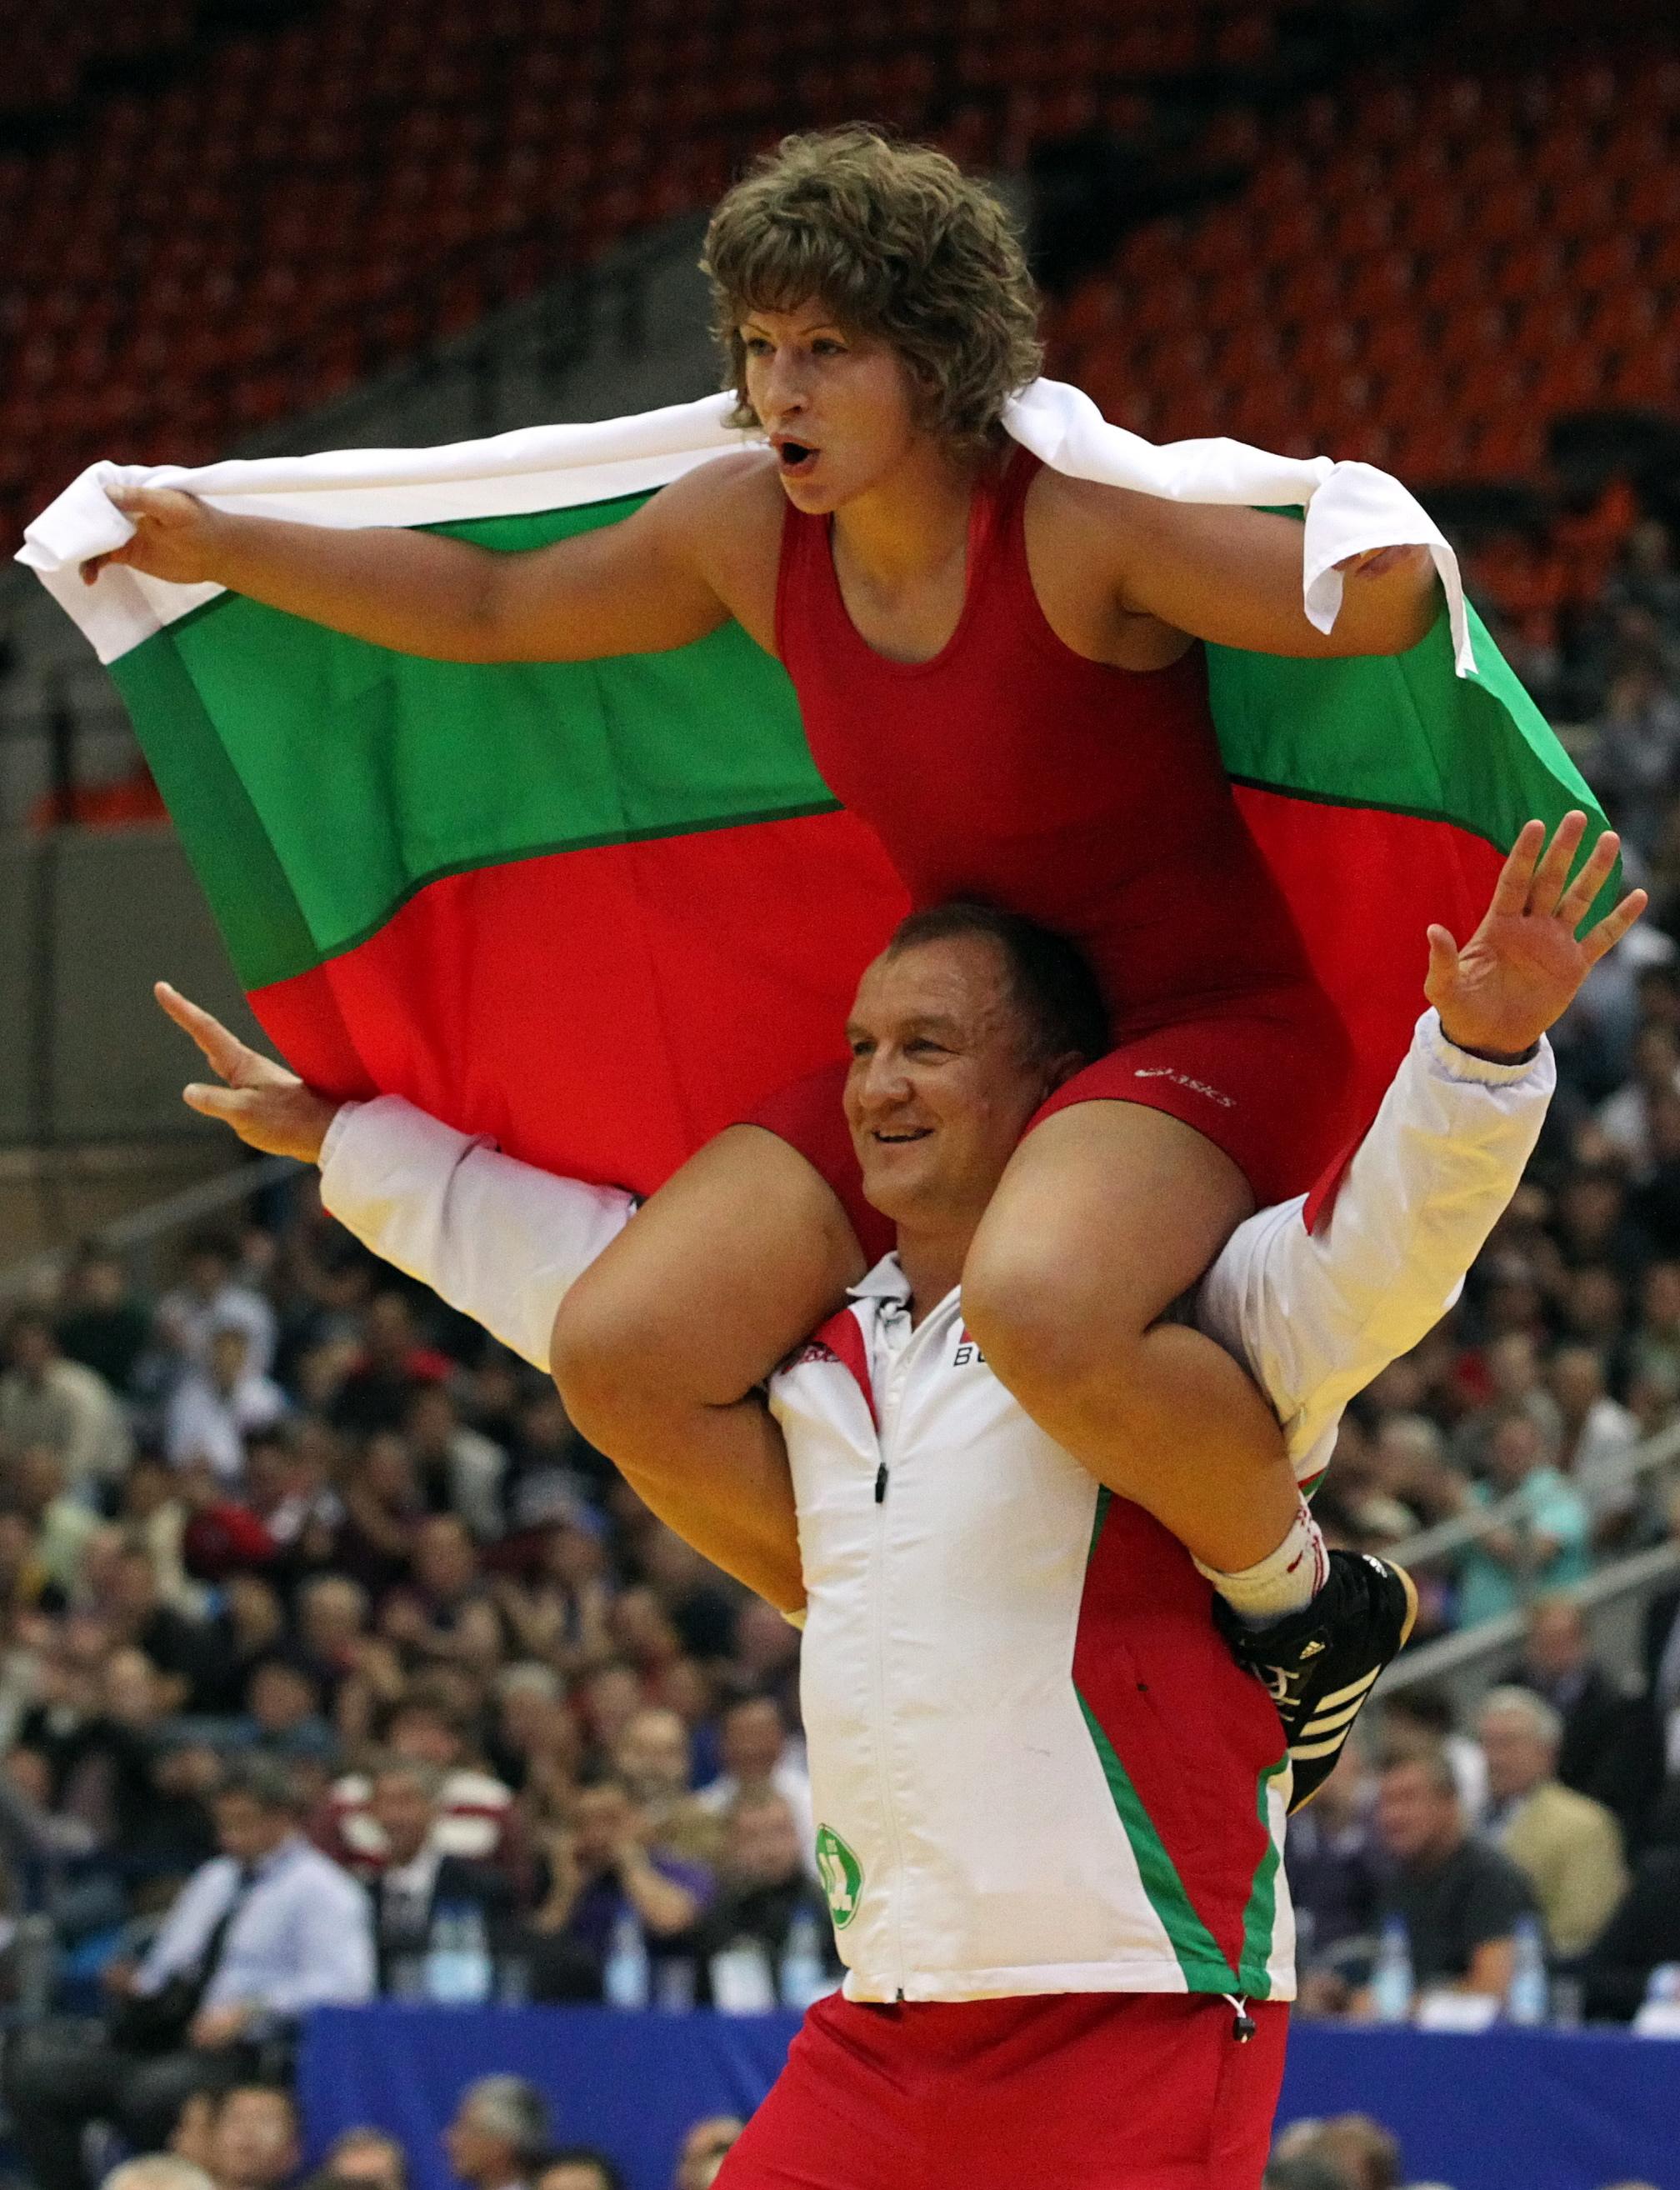 Станка Златева посяга към нова титла в Баку